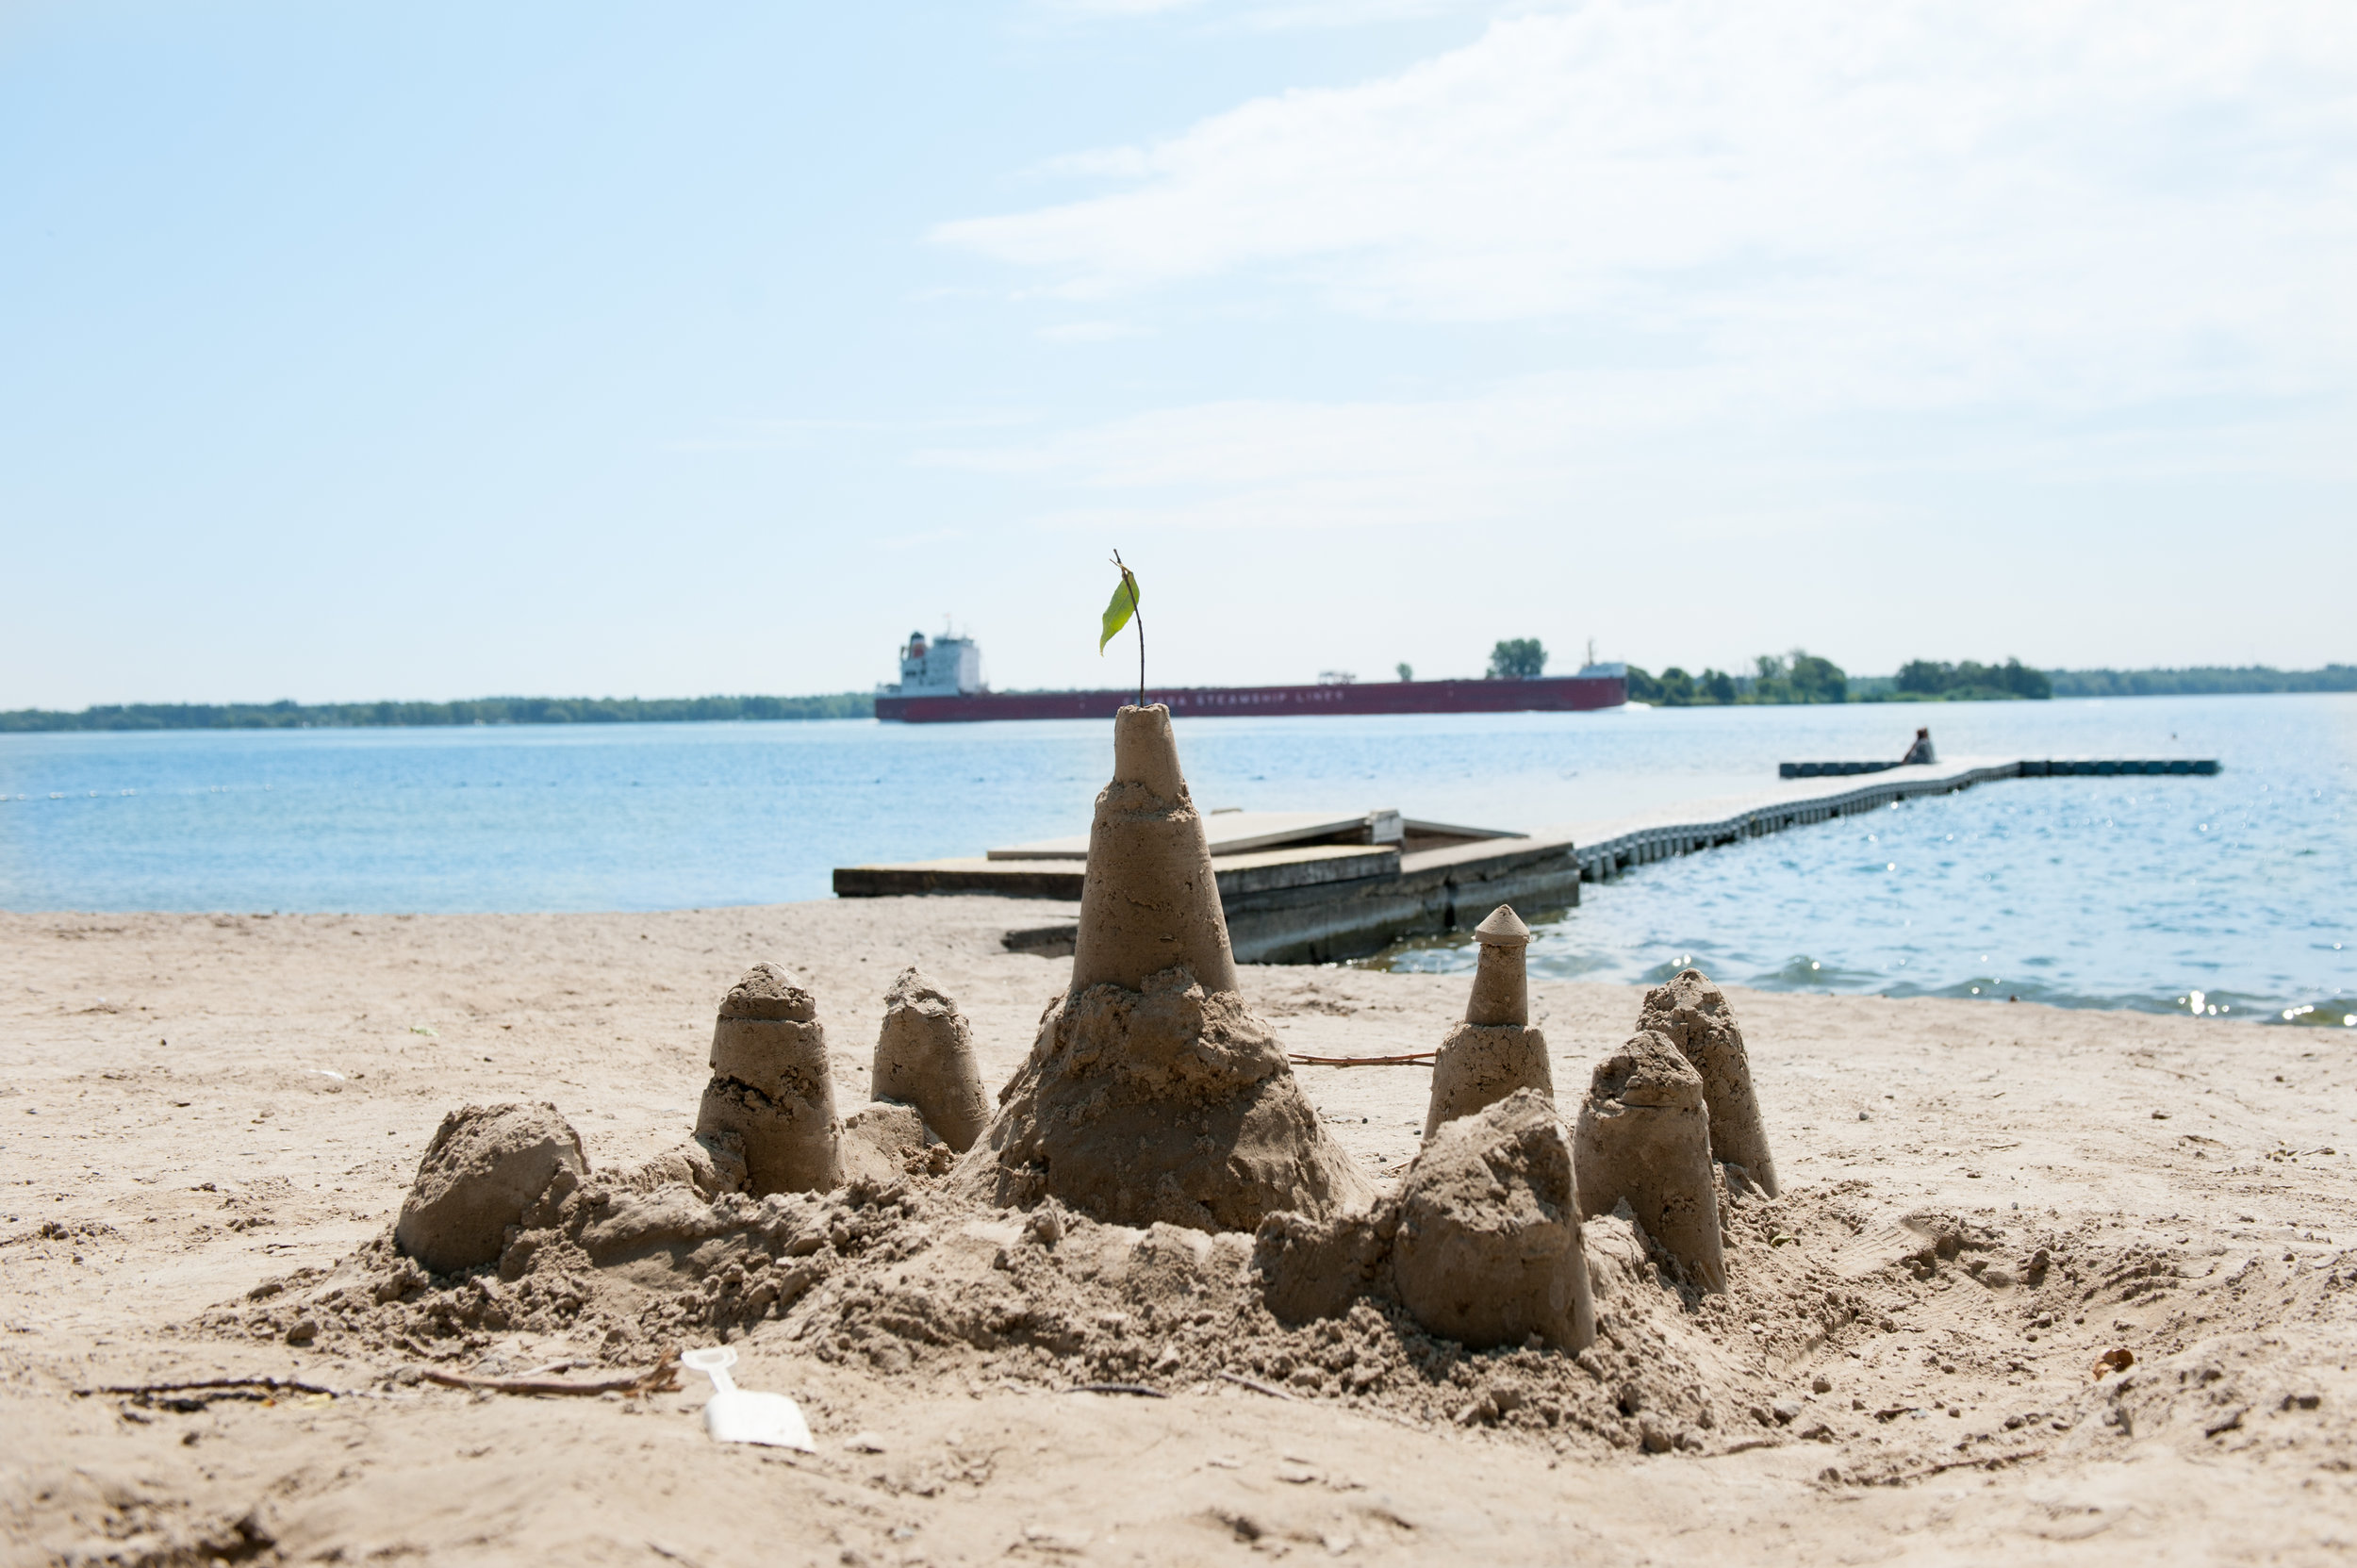 SD-Morisburg beach-1.jpg